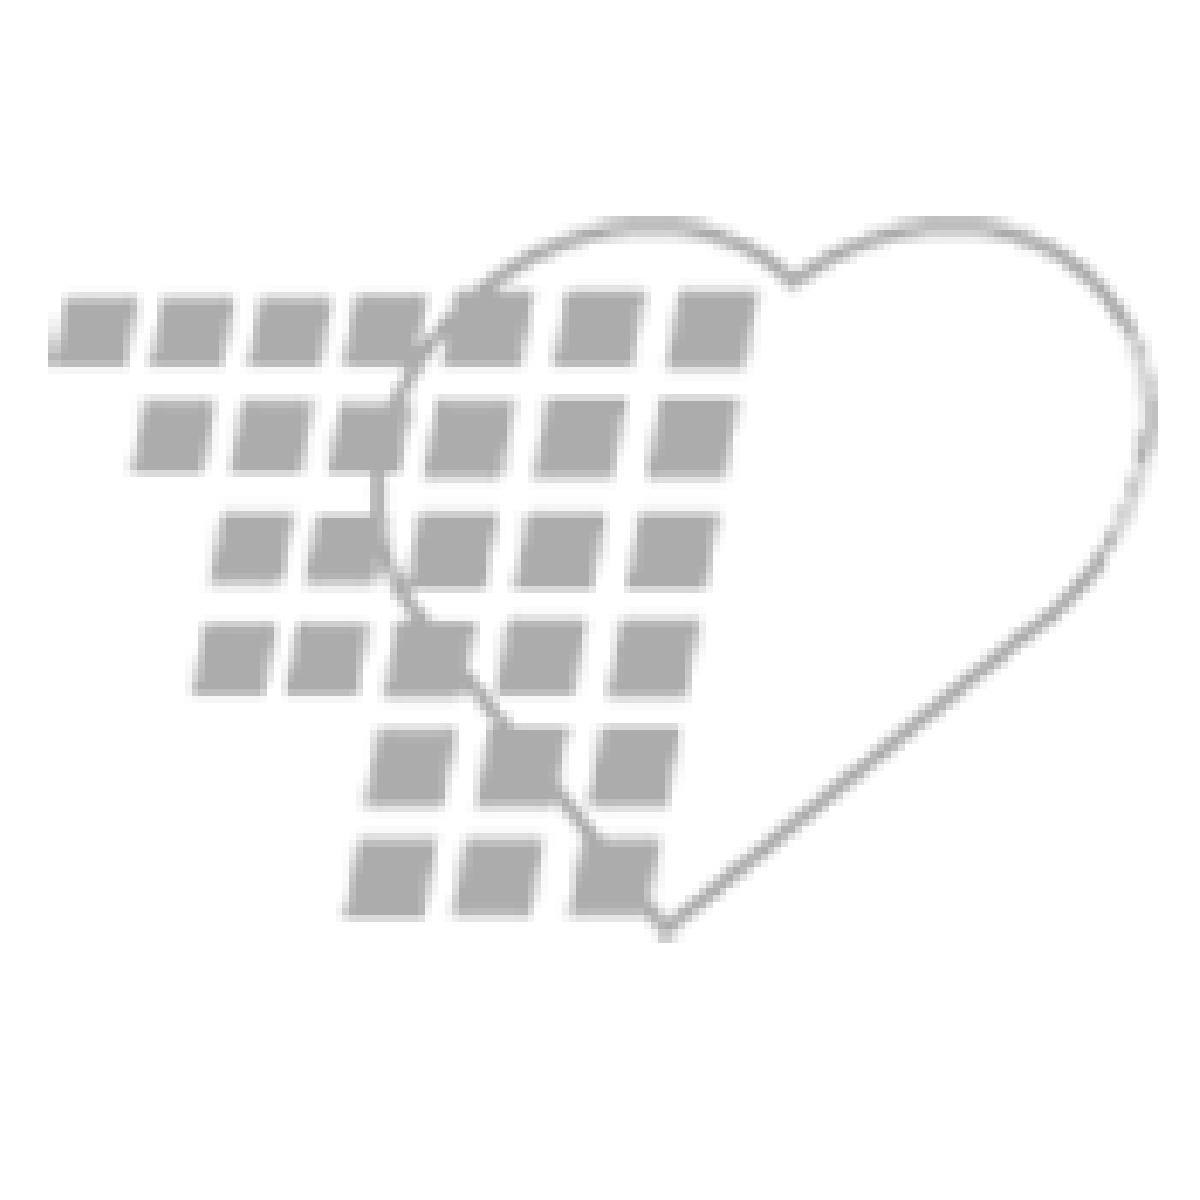 06-93-0732 Demo Dose® Lorazepm (Ativn) 1mg - 100 Pills/Box